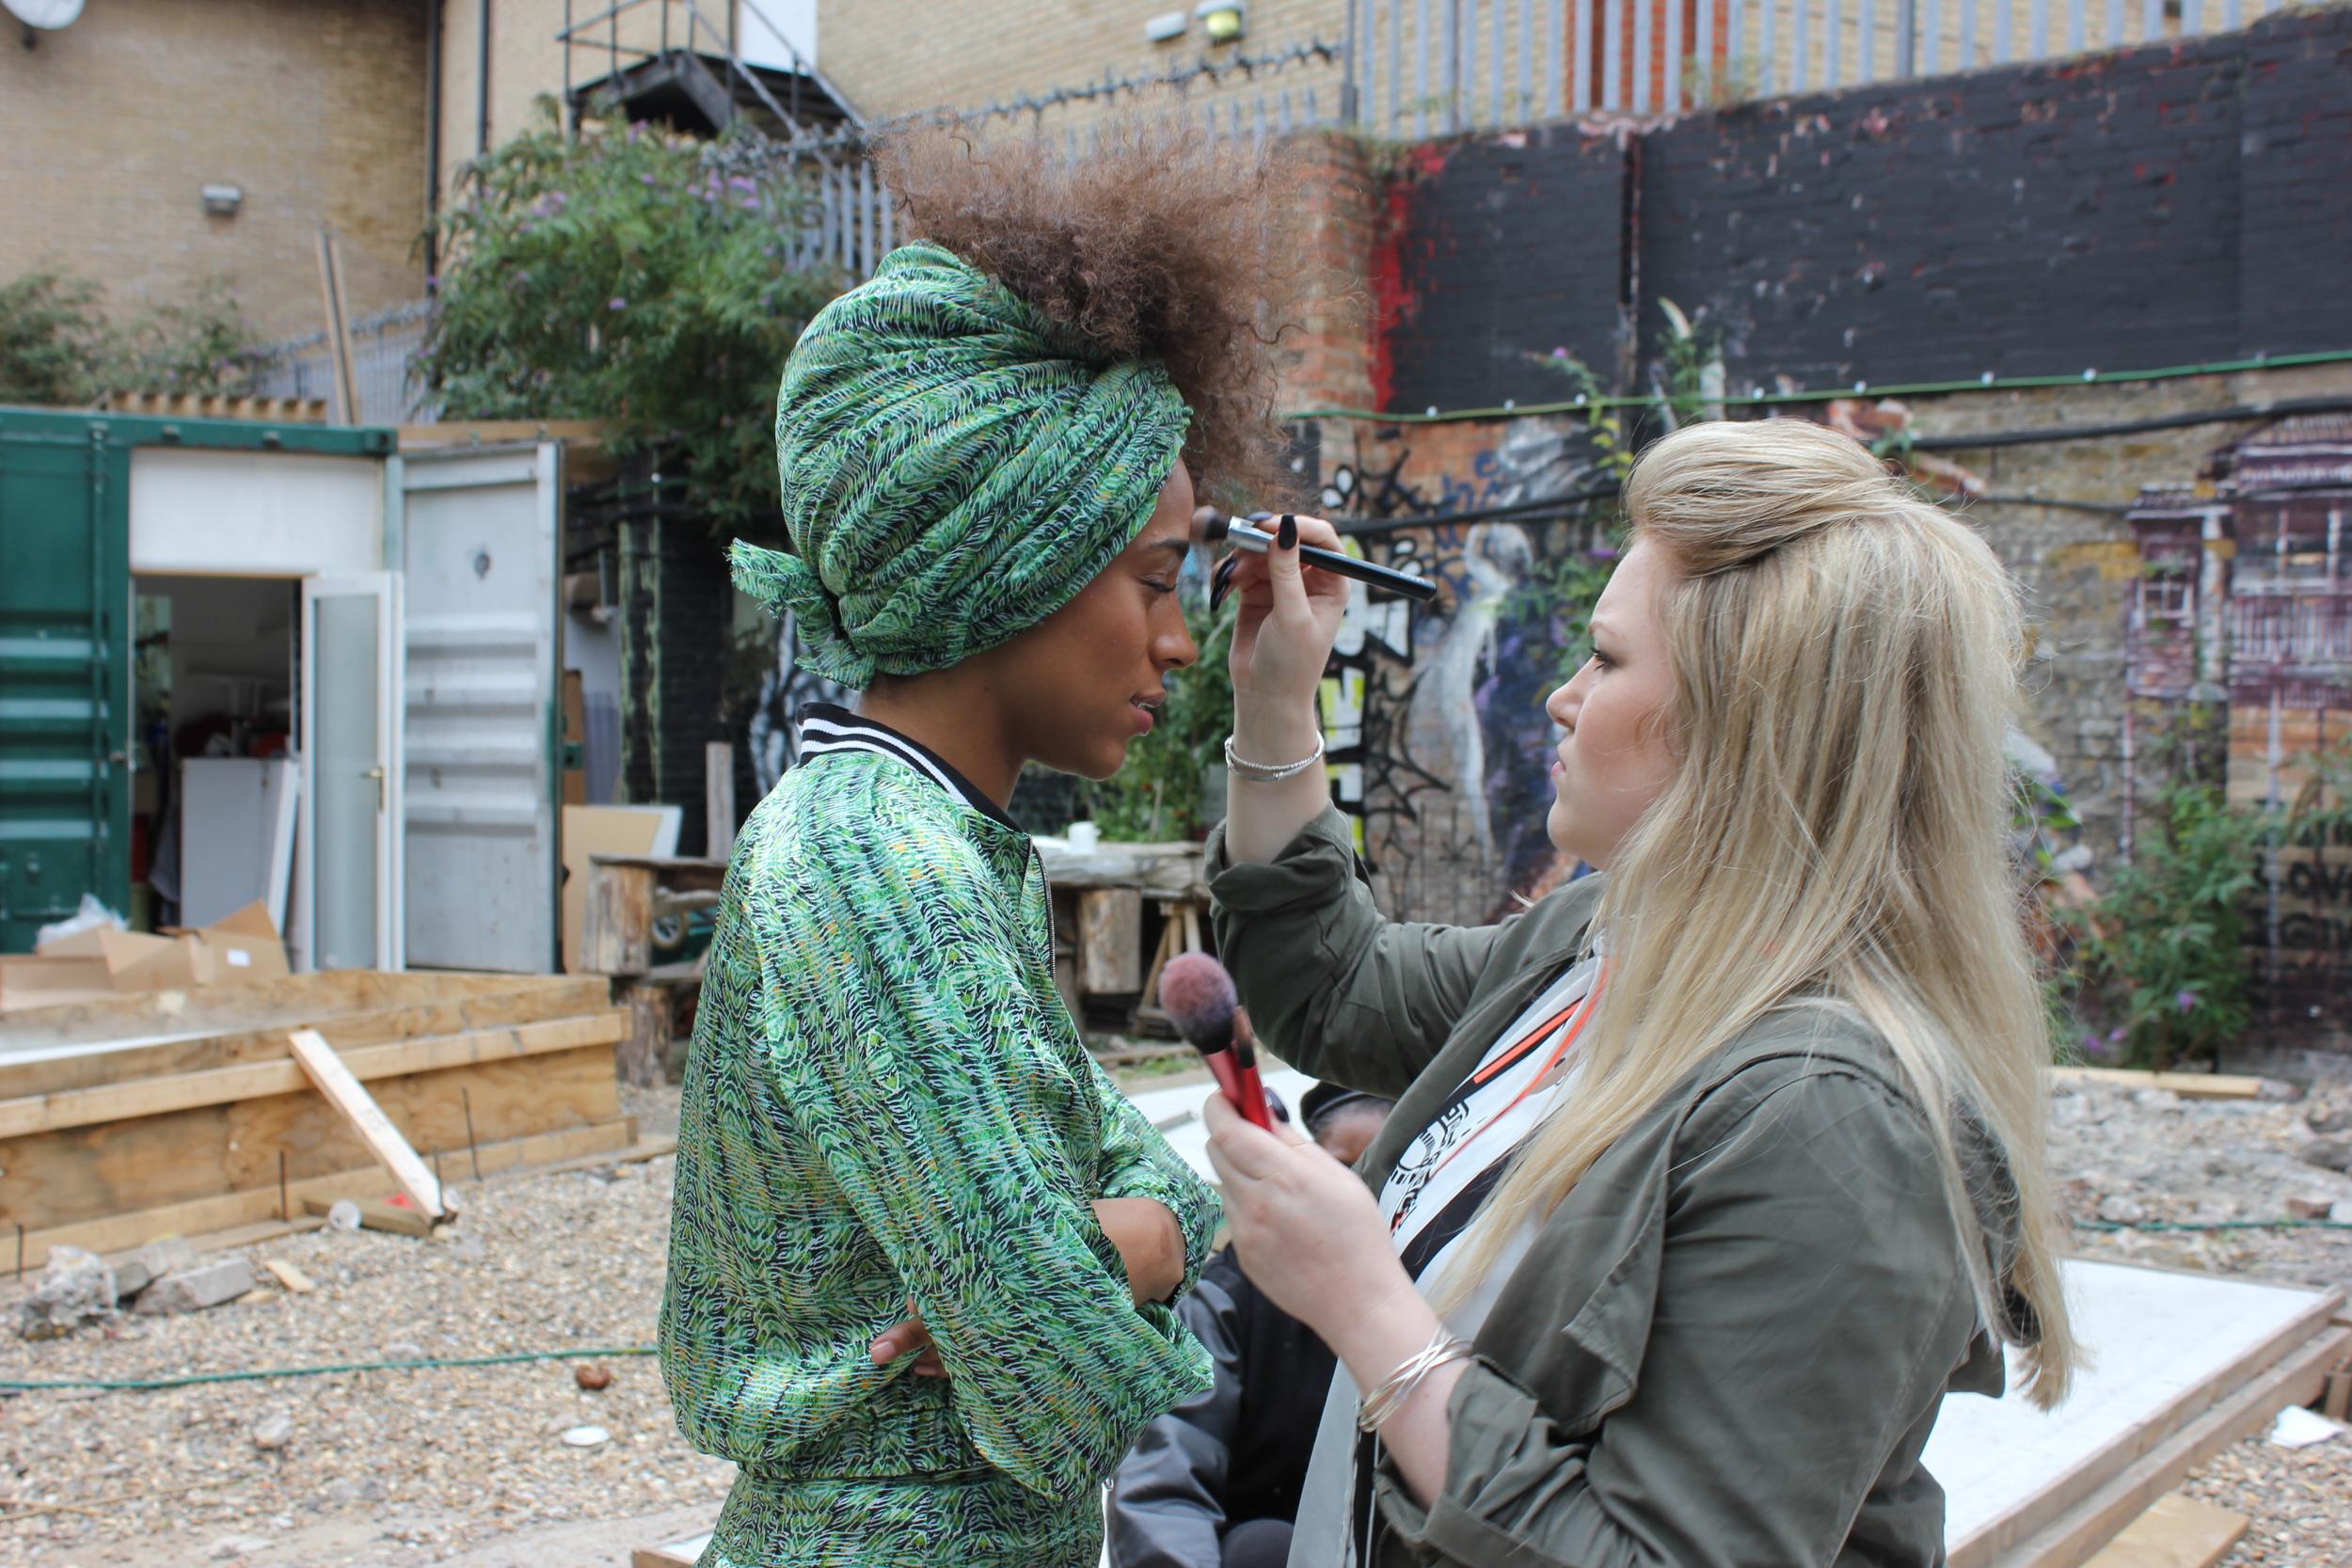 #BTS - Ayisha on set with MUA Chantele Phillips at Yemzi SS16 lookbook shoot in Dalston